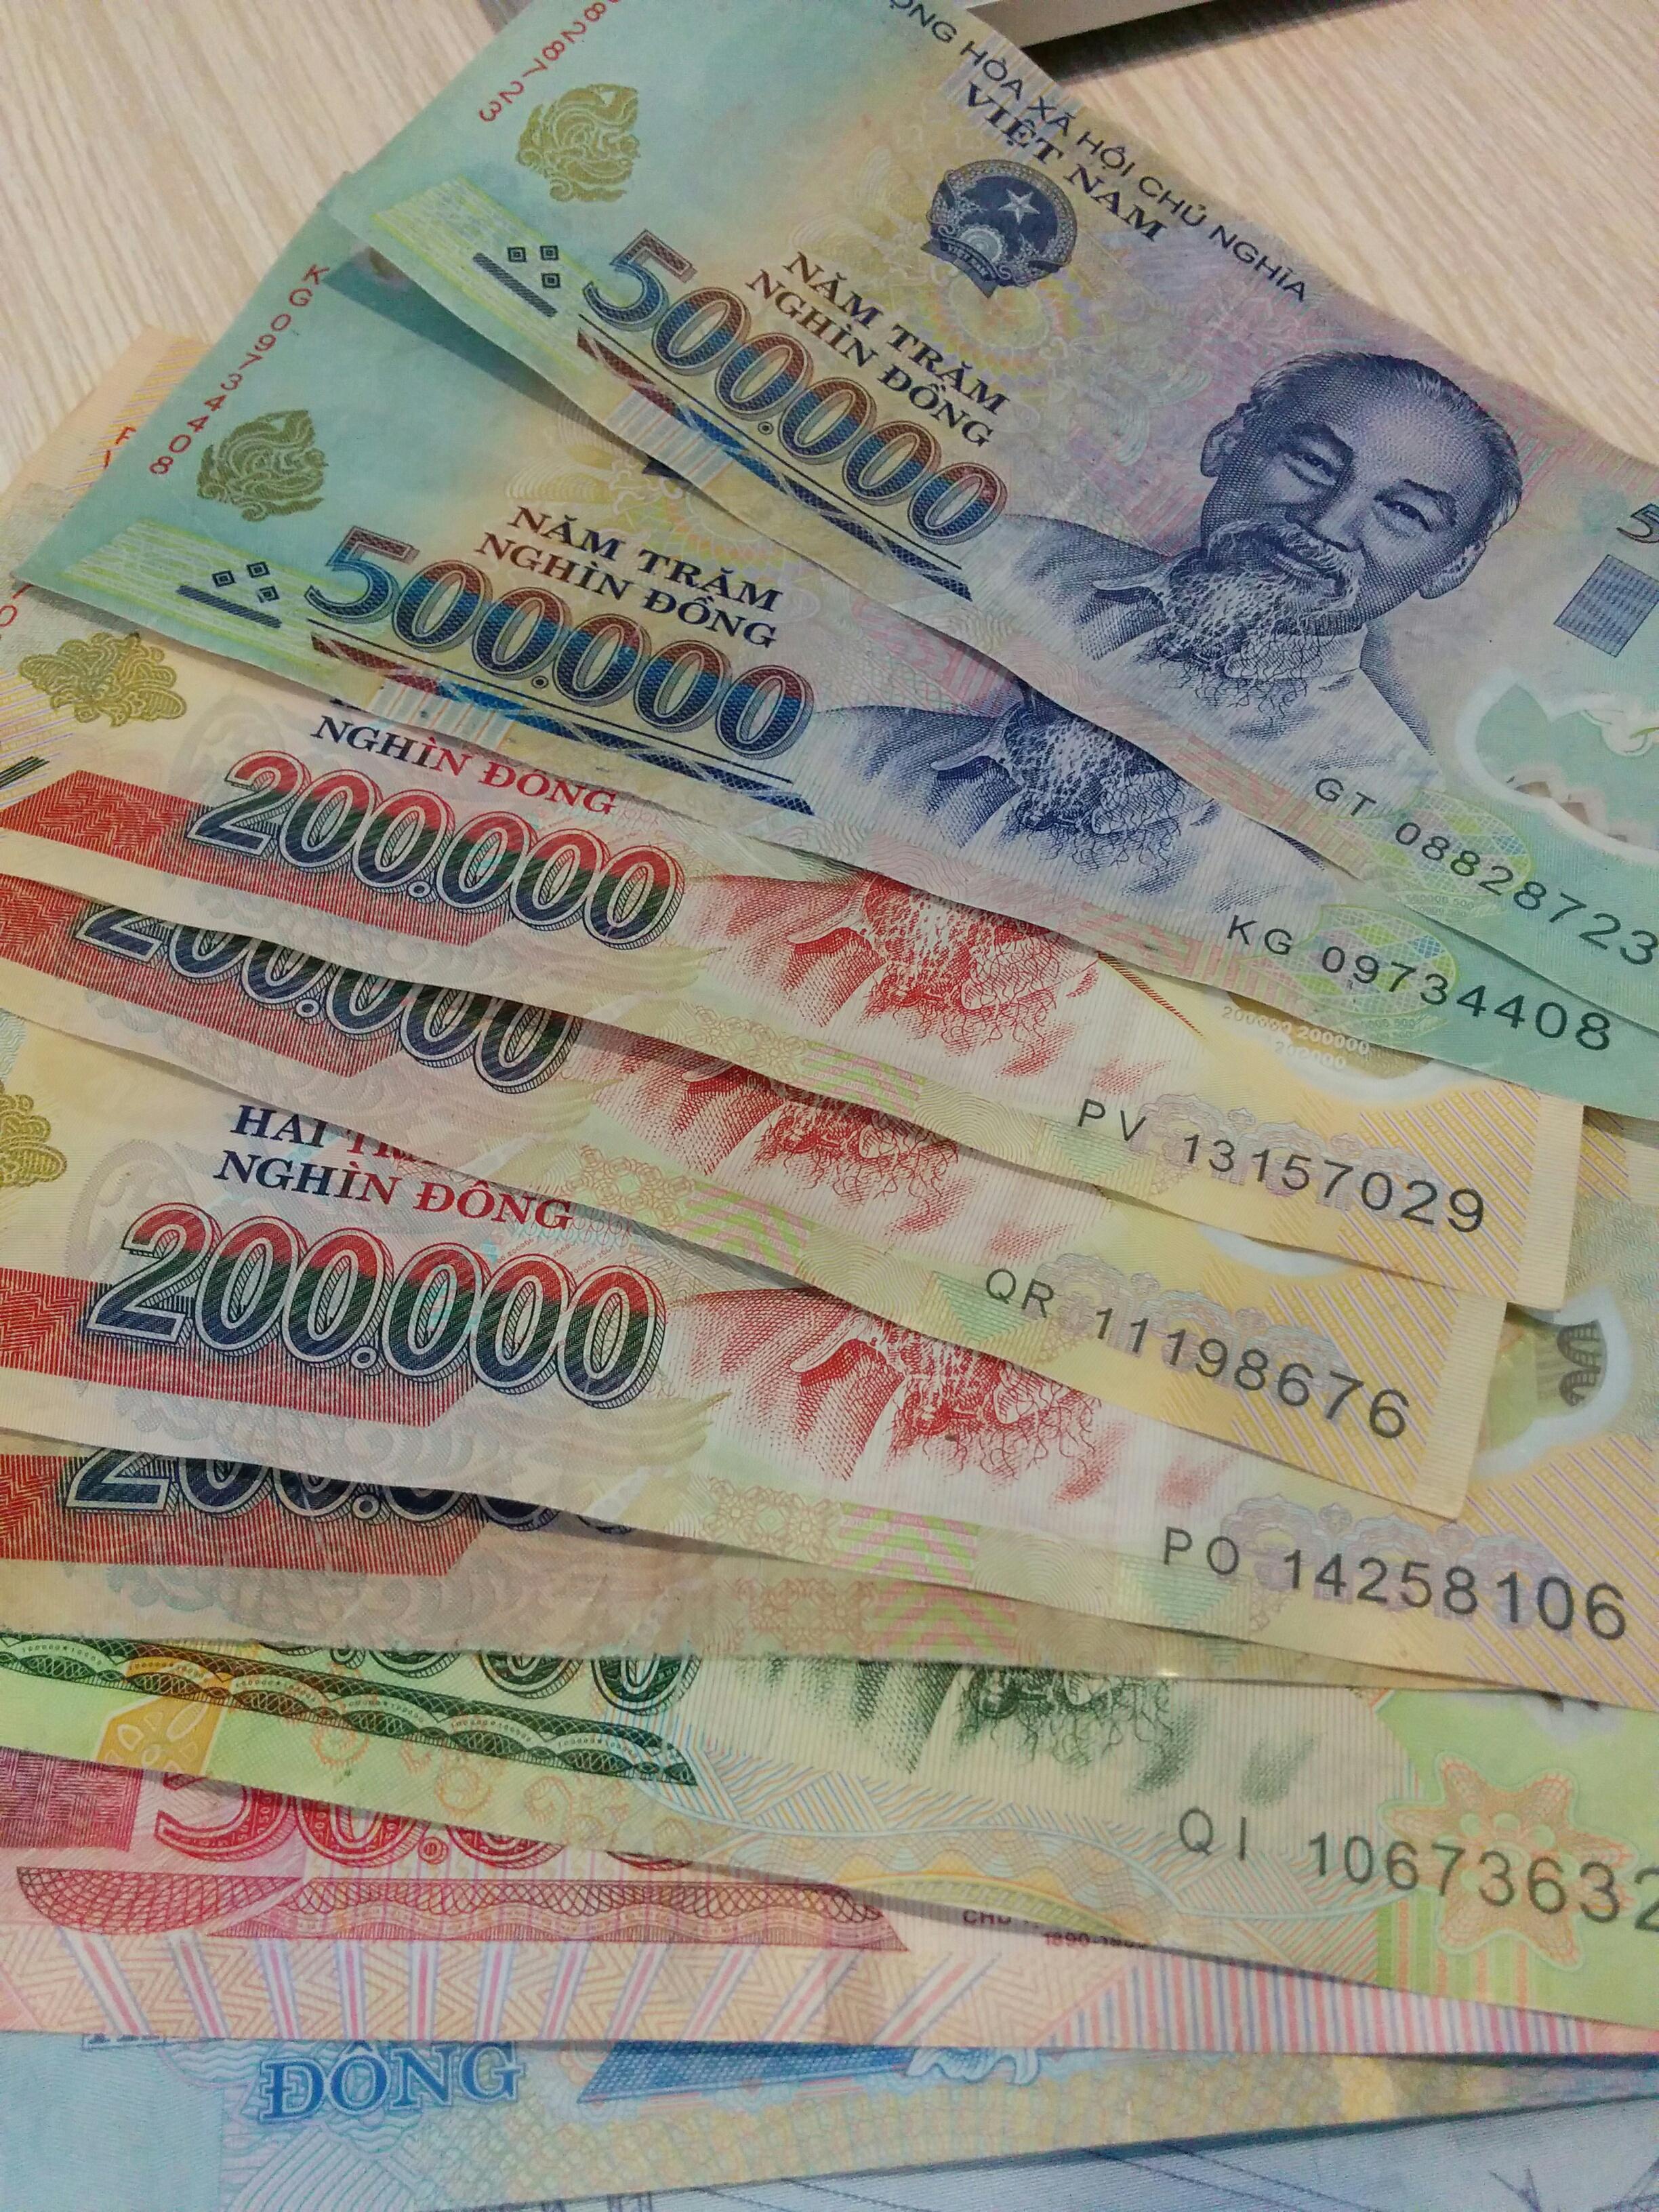 FREE IMAGES CURRENCY BILLS CASH BANKNOTE MONEY HANDLING PAPER